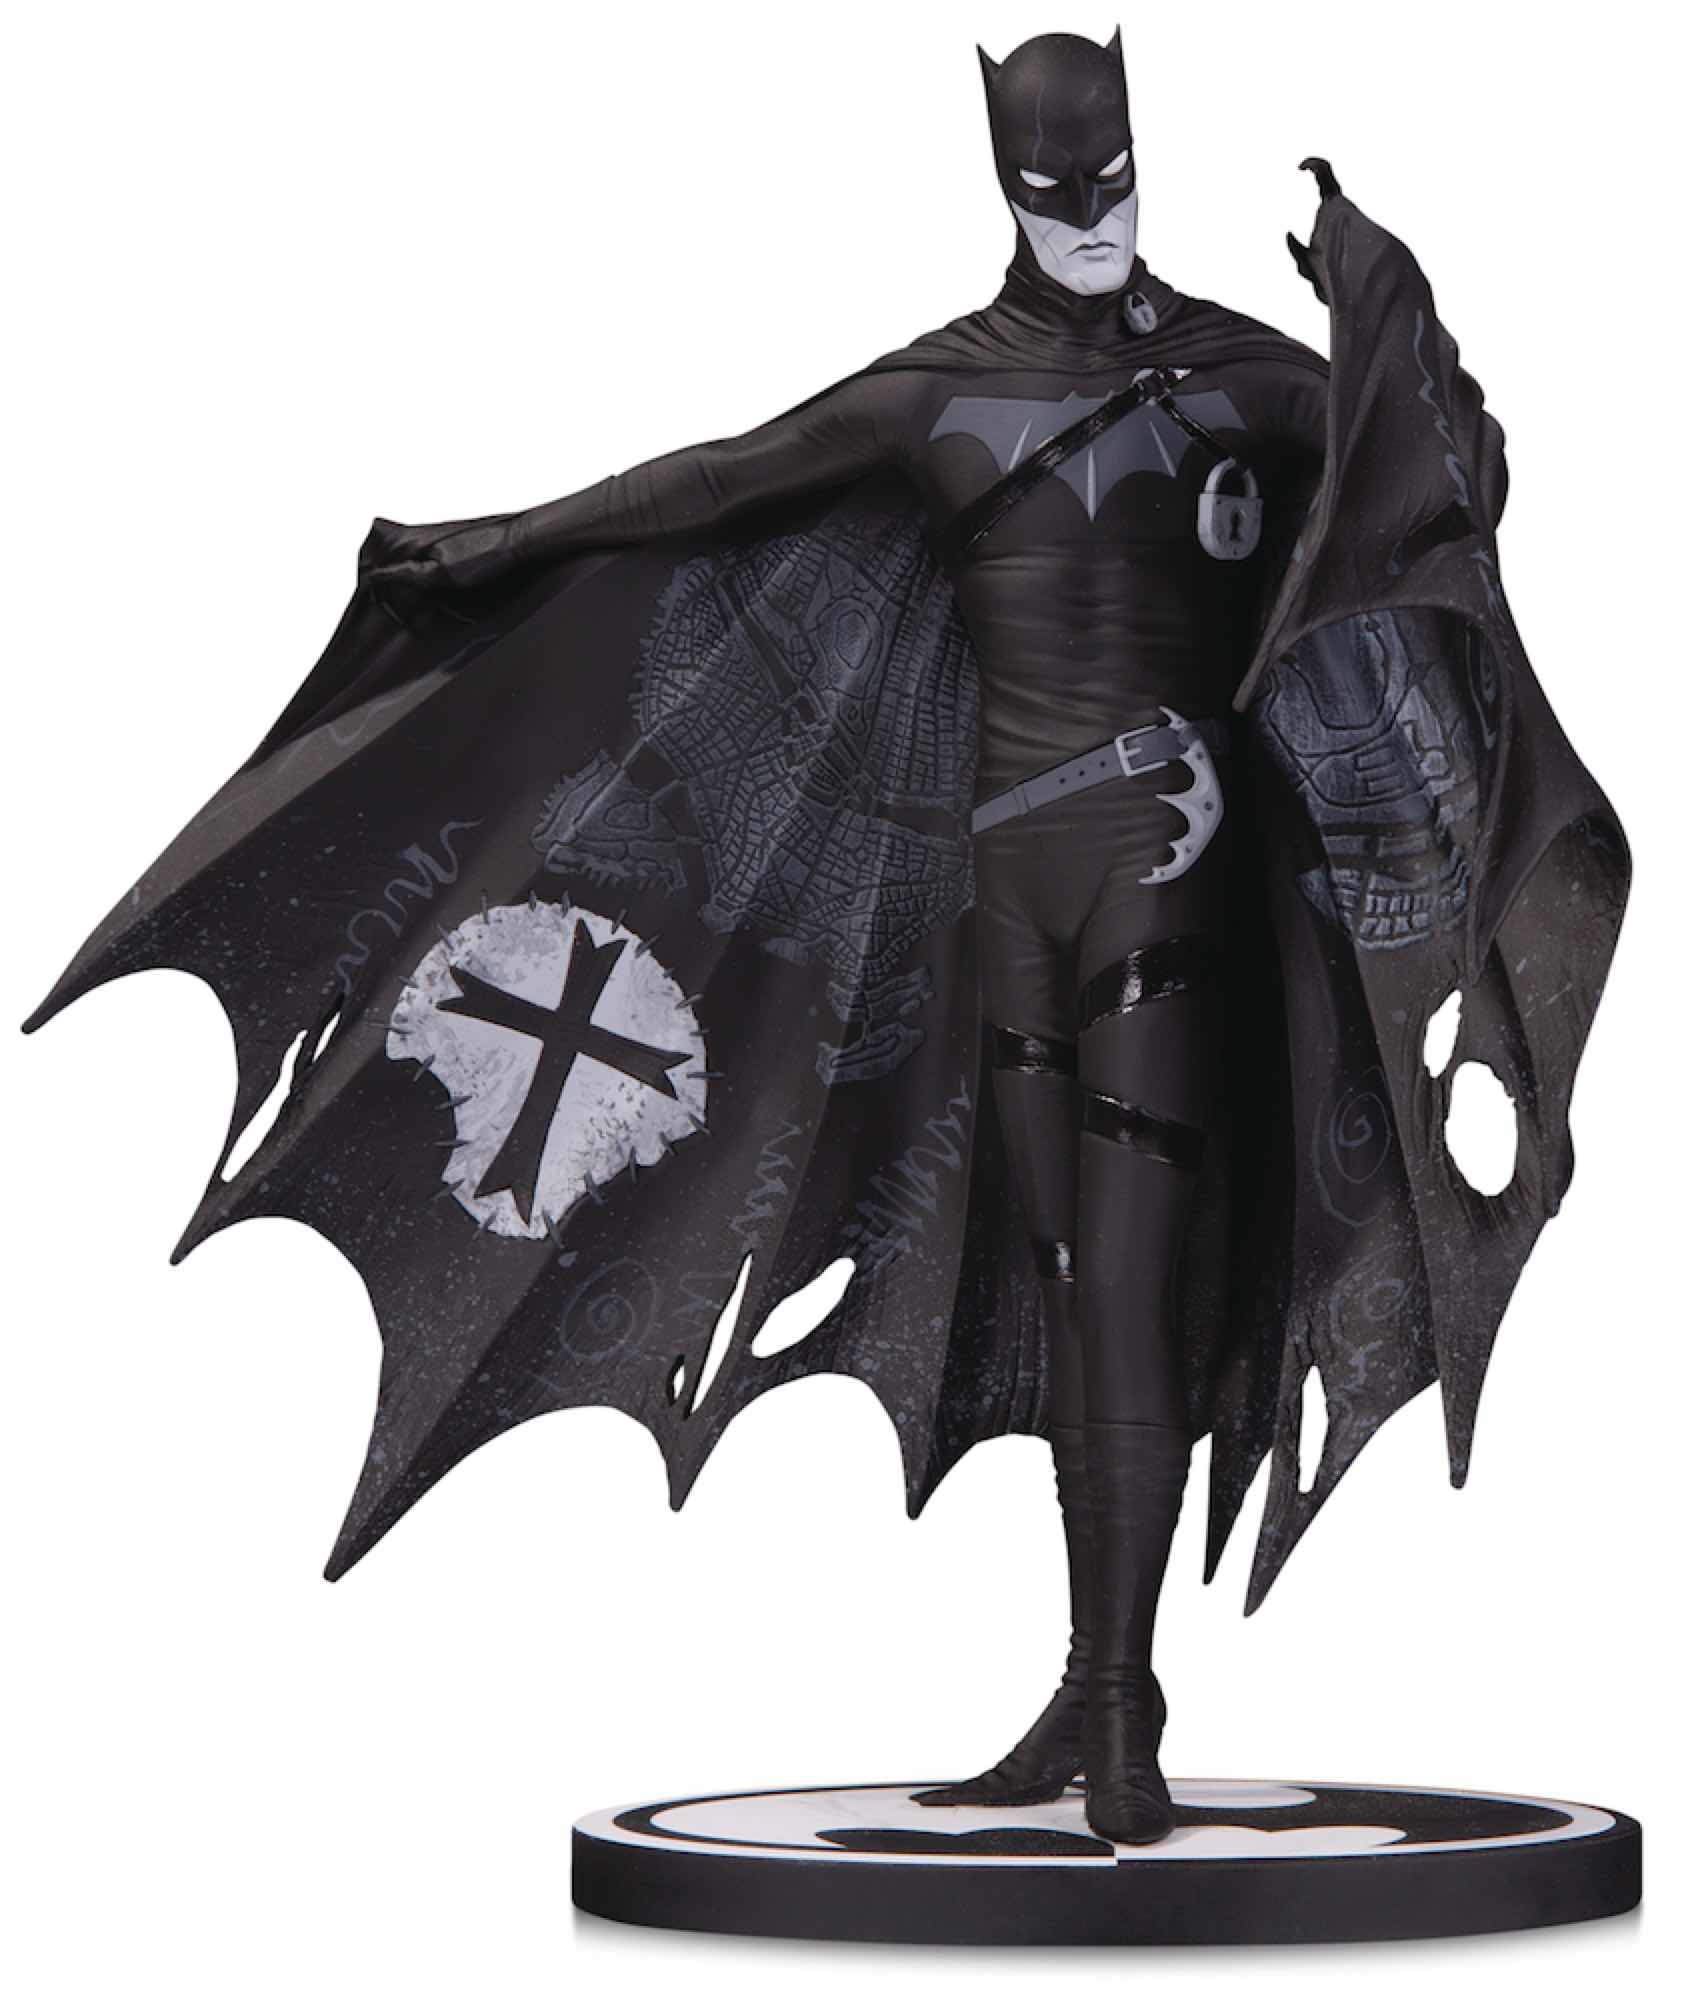 BATMAN B&W BLACK AND WHITE BY GERARD WAY ESTATUA 19.5 CM BATMAN UNIVERSO DC